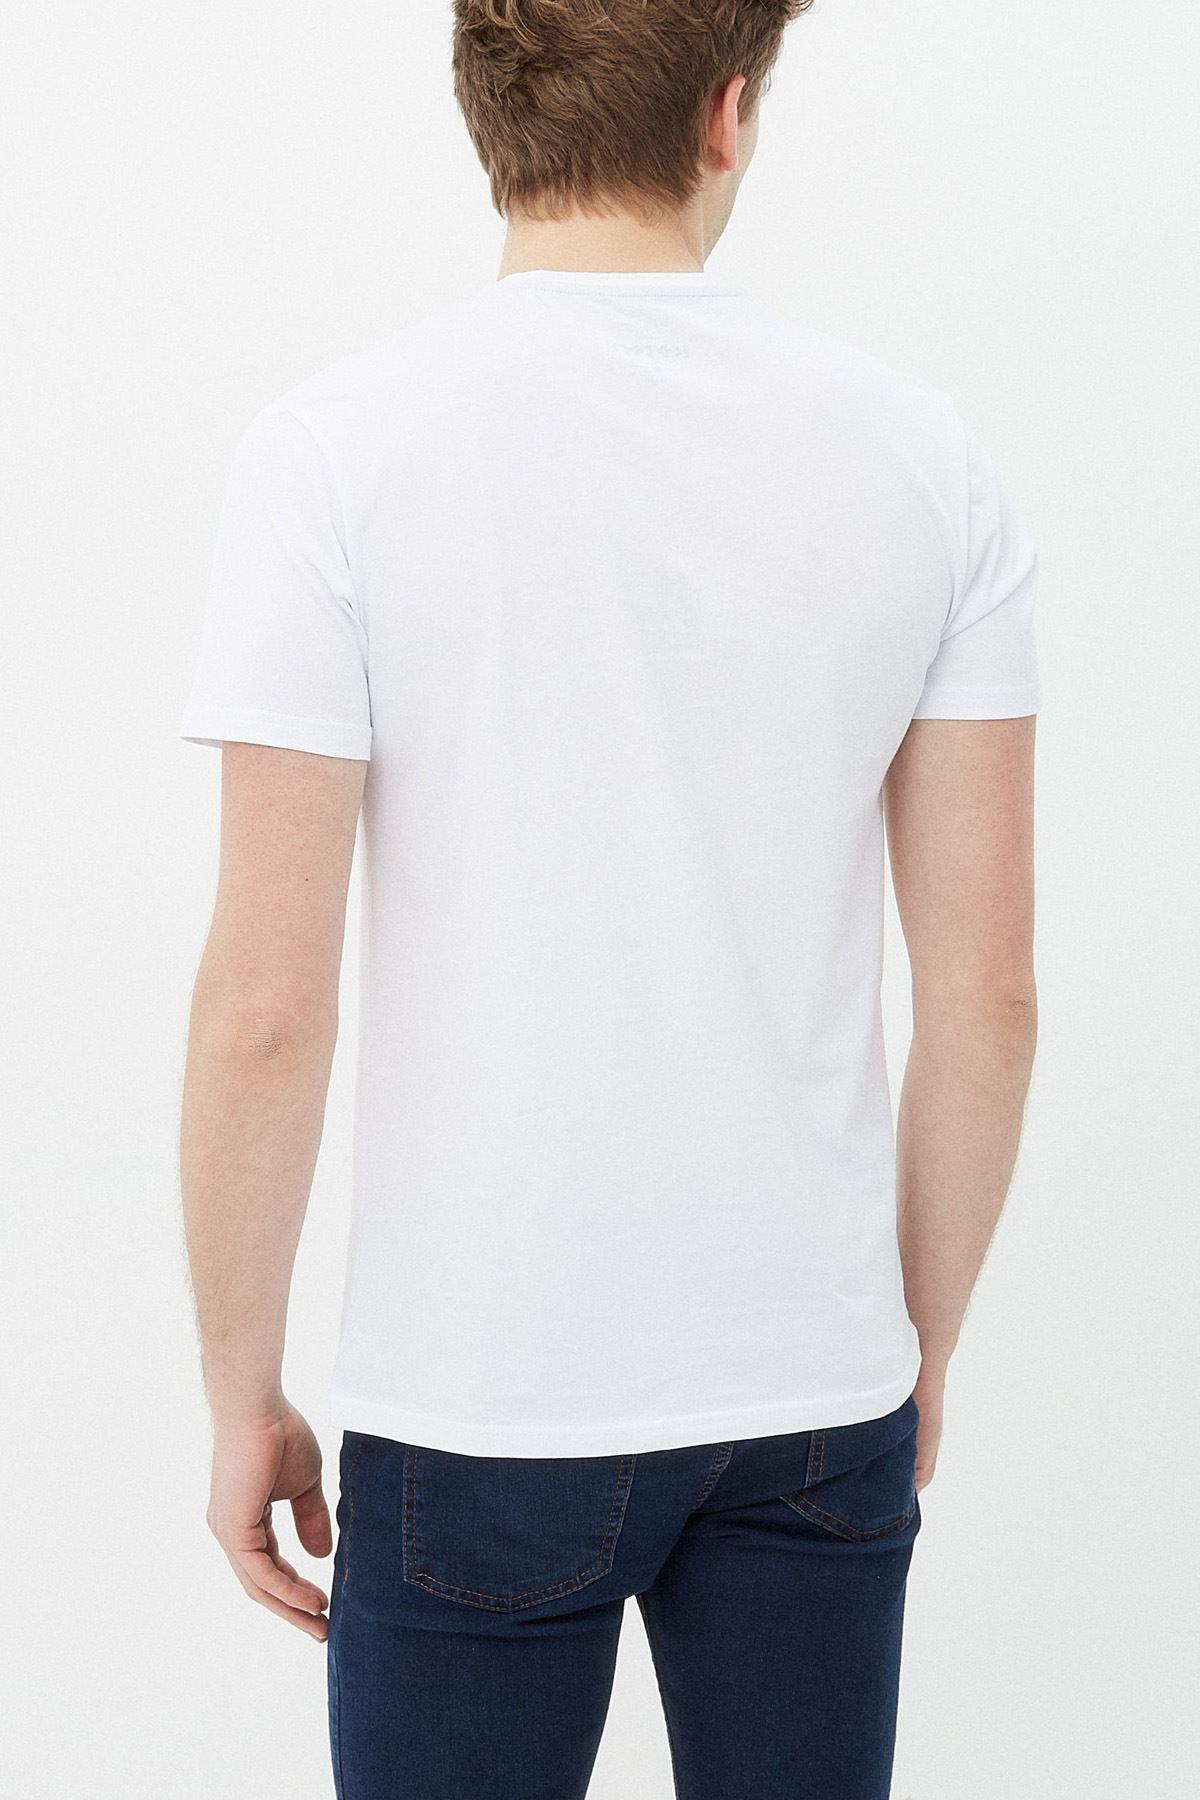 Naruto Anime 01 Beyaz Erkek Tshirt - Tişört